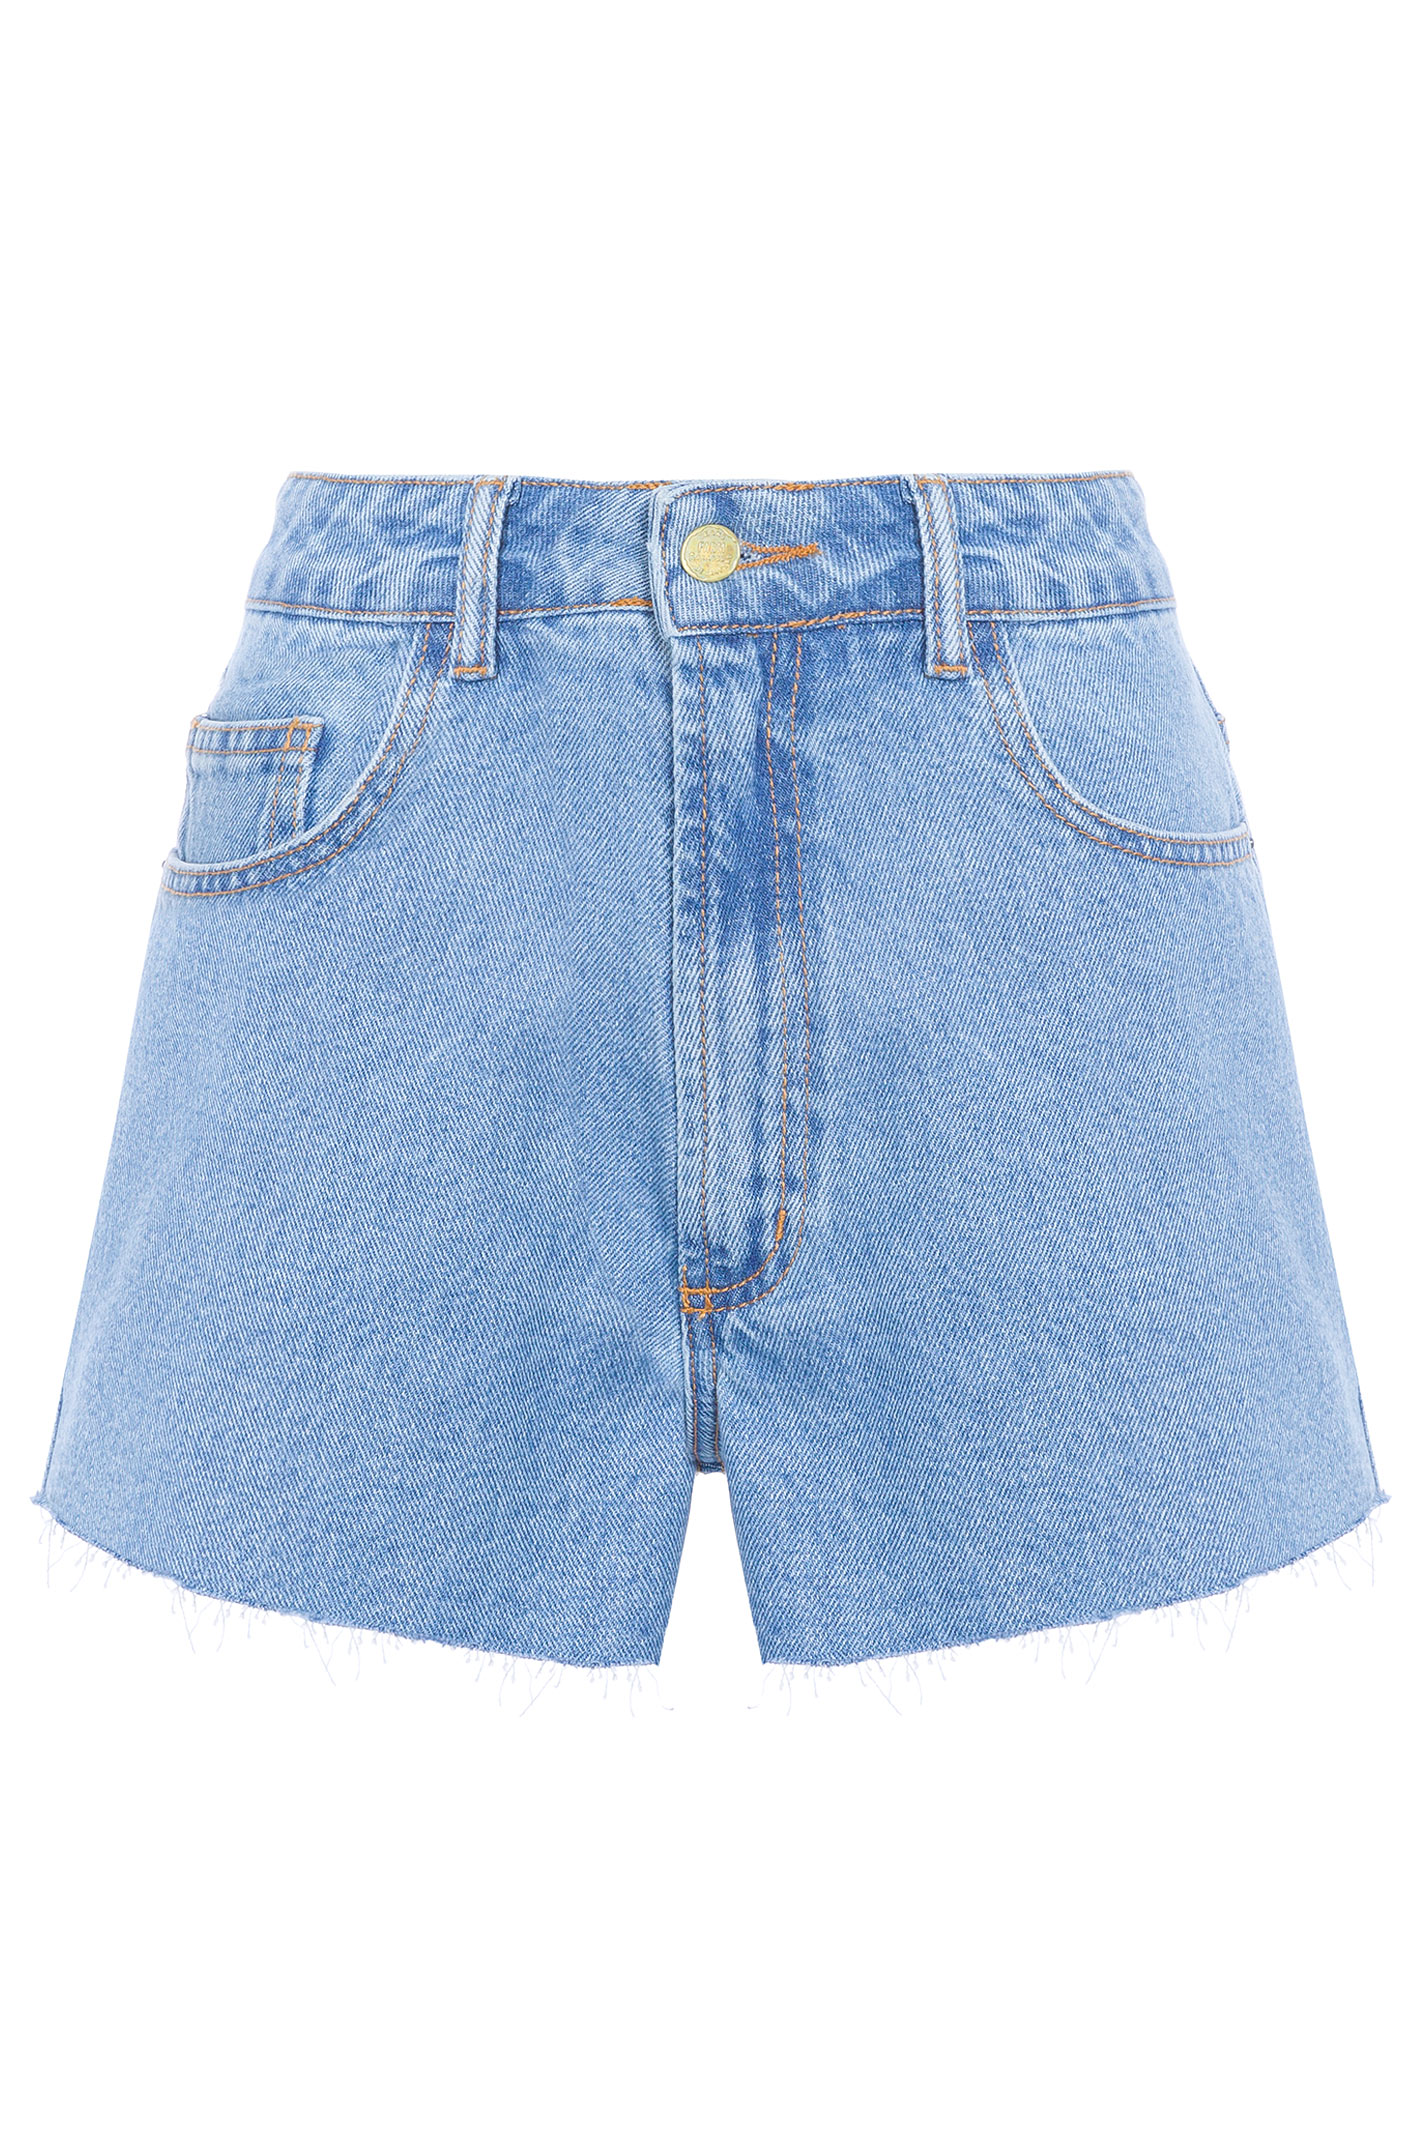 Short Calango Refarm Jeans